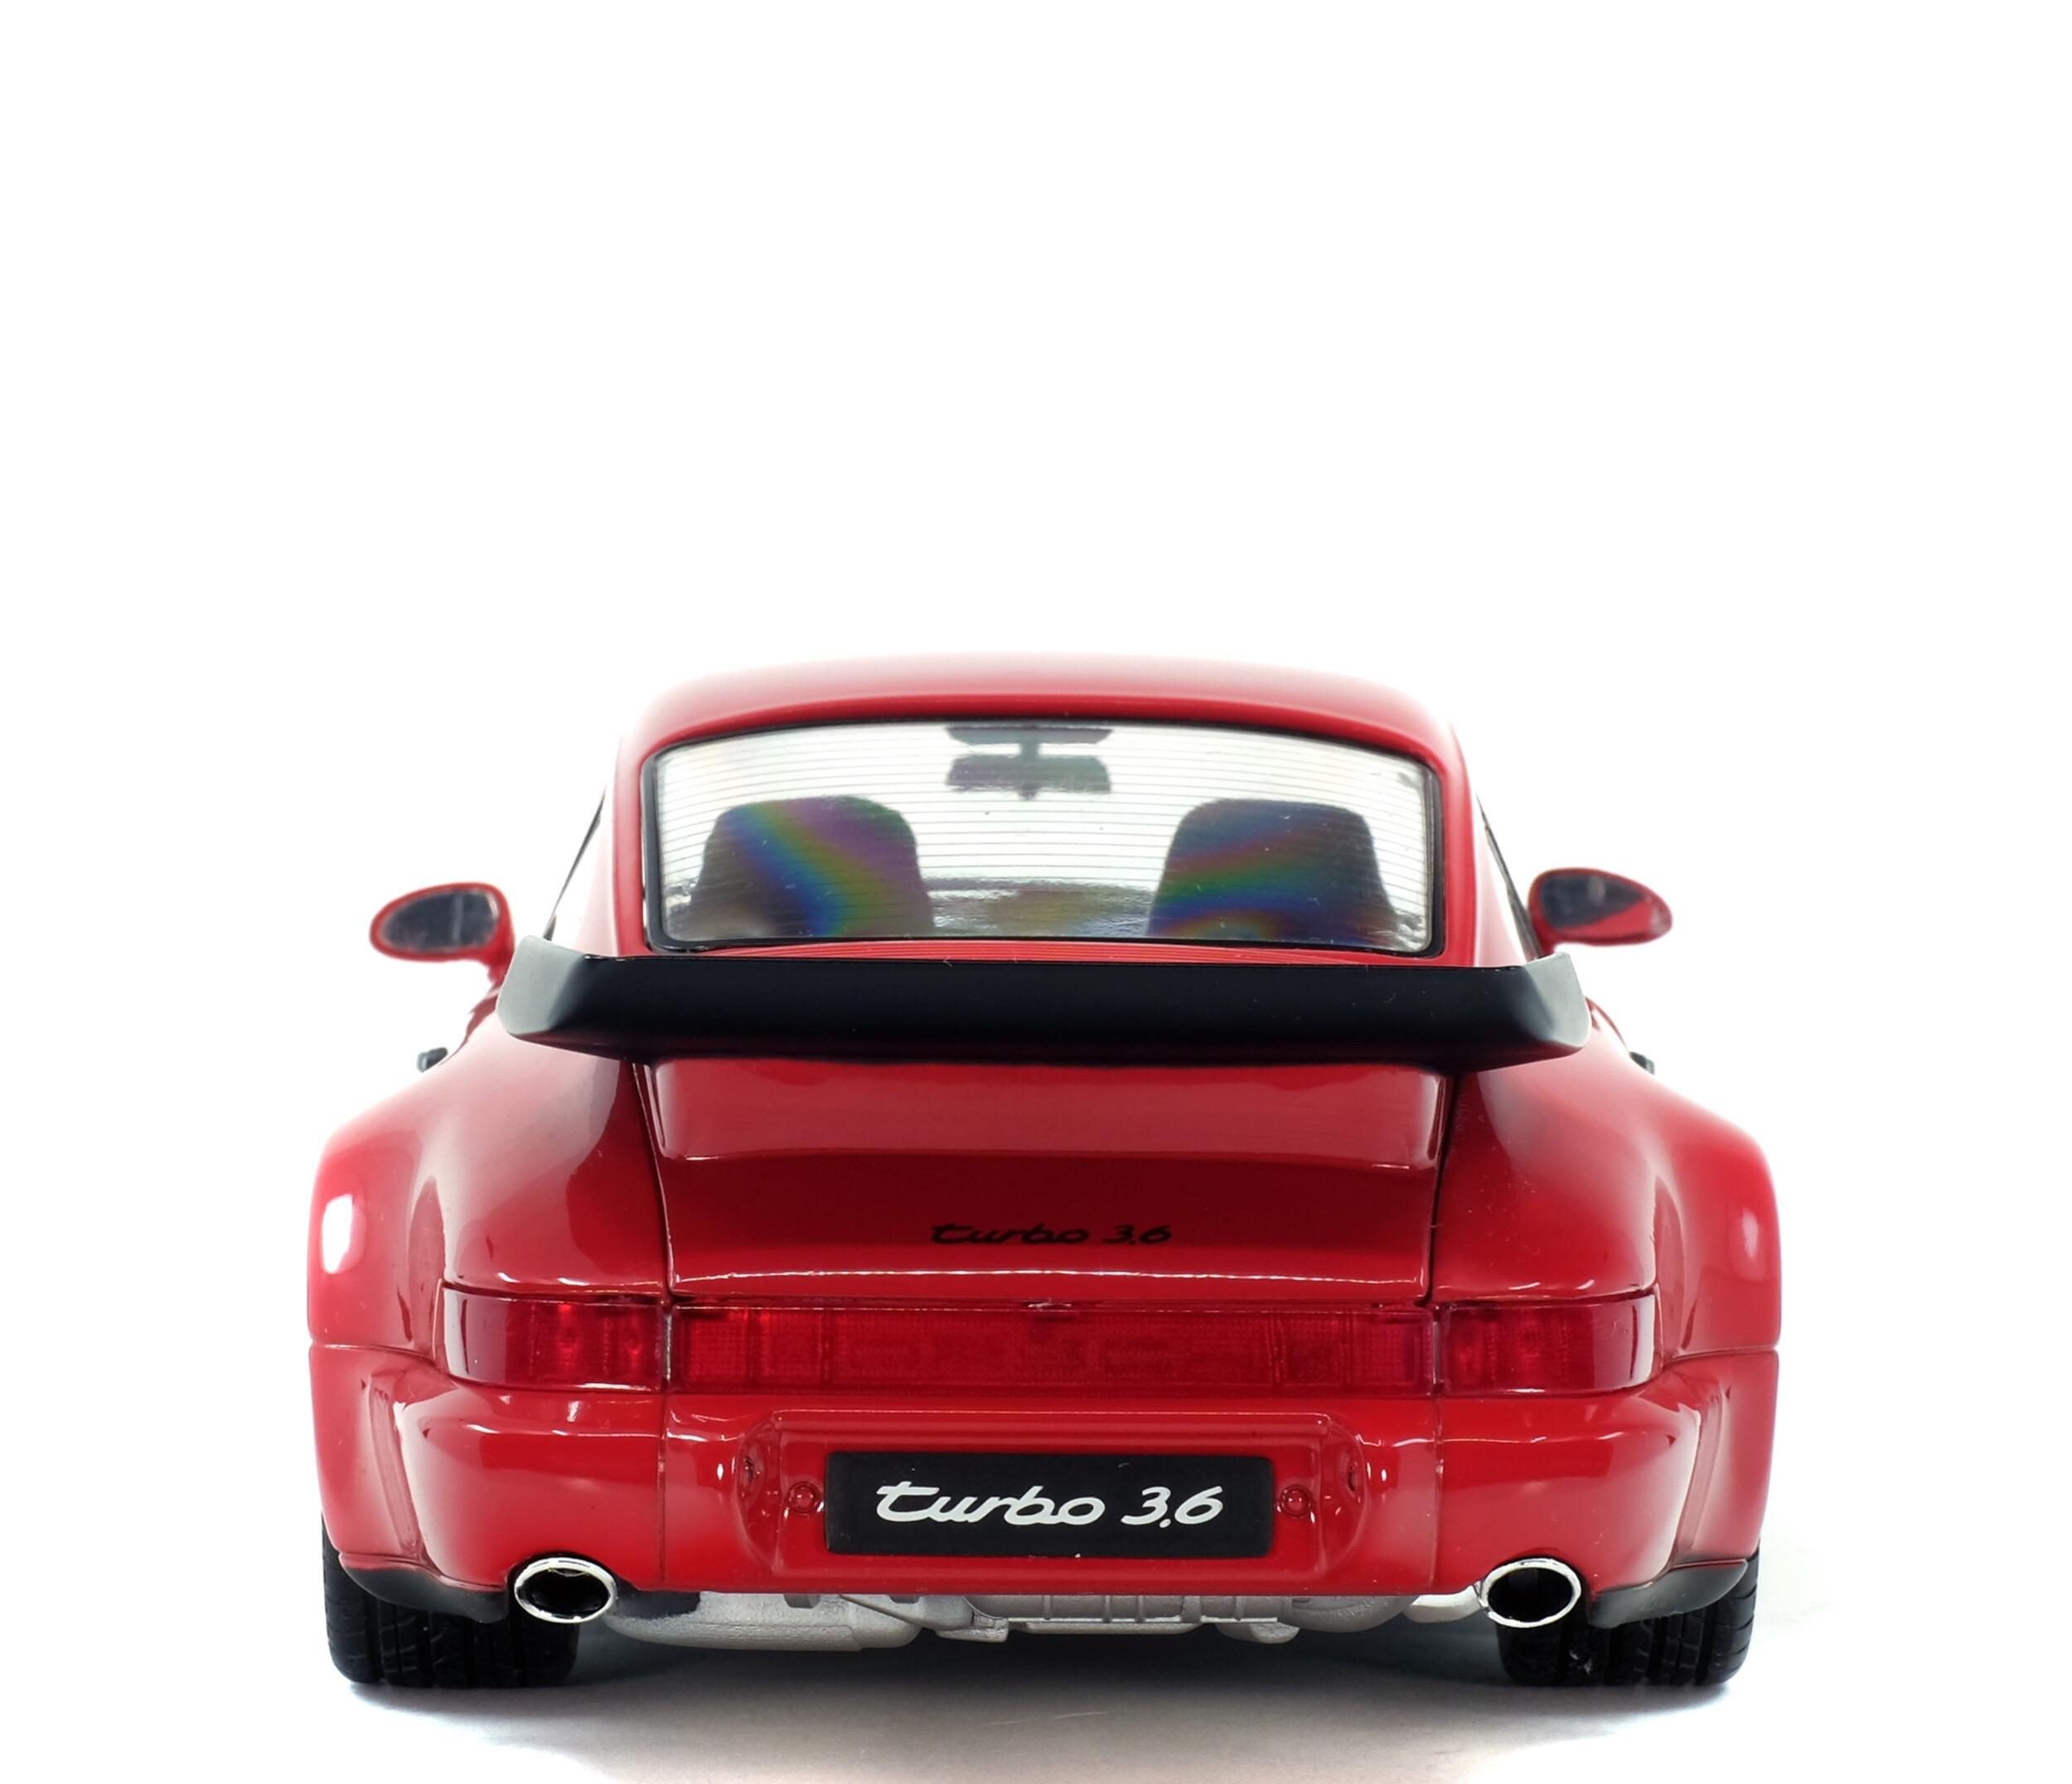 Porsche 911 964 Turbo 3 6 Rouge Indien 1990 Solido